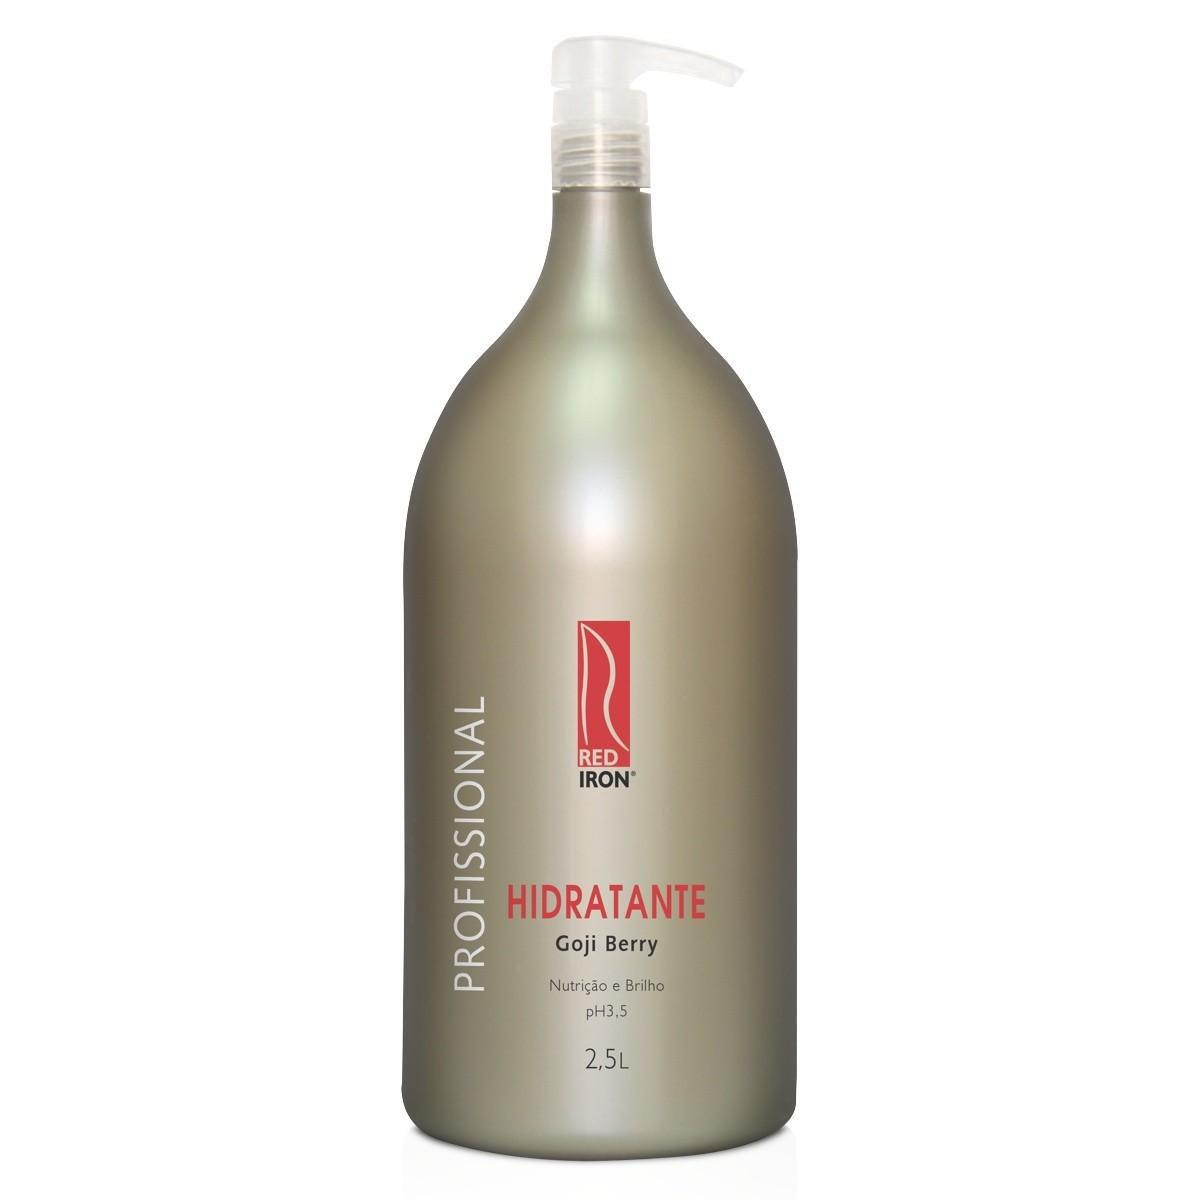 Red Iron Hidratante Goji Berry Profissional 2,5lt